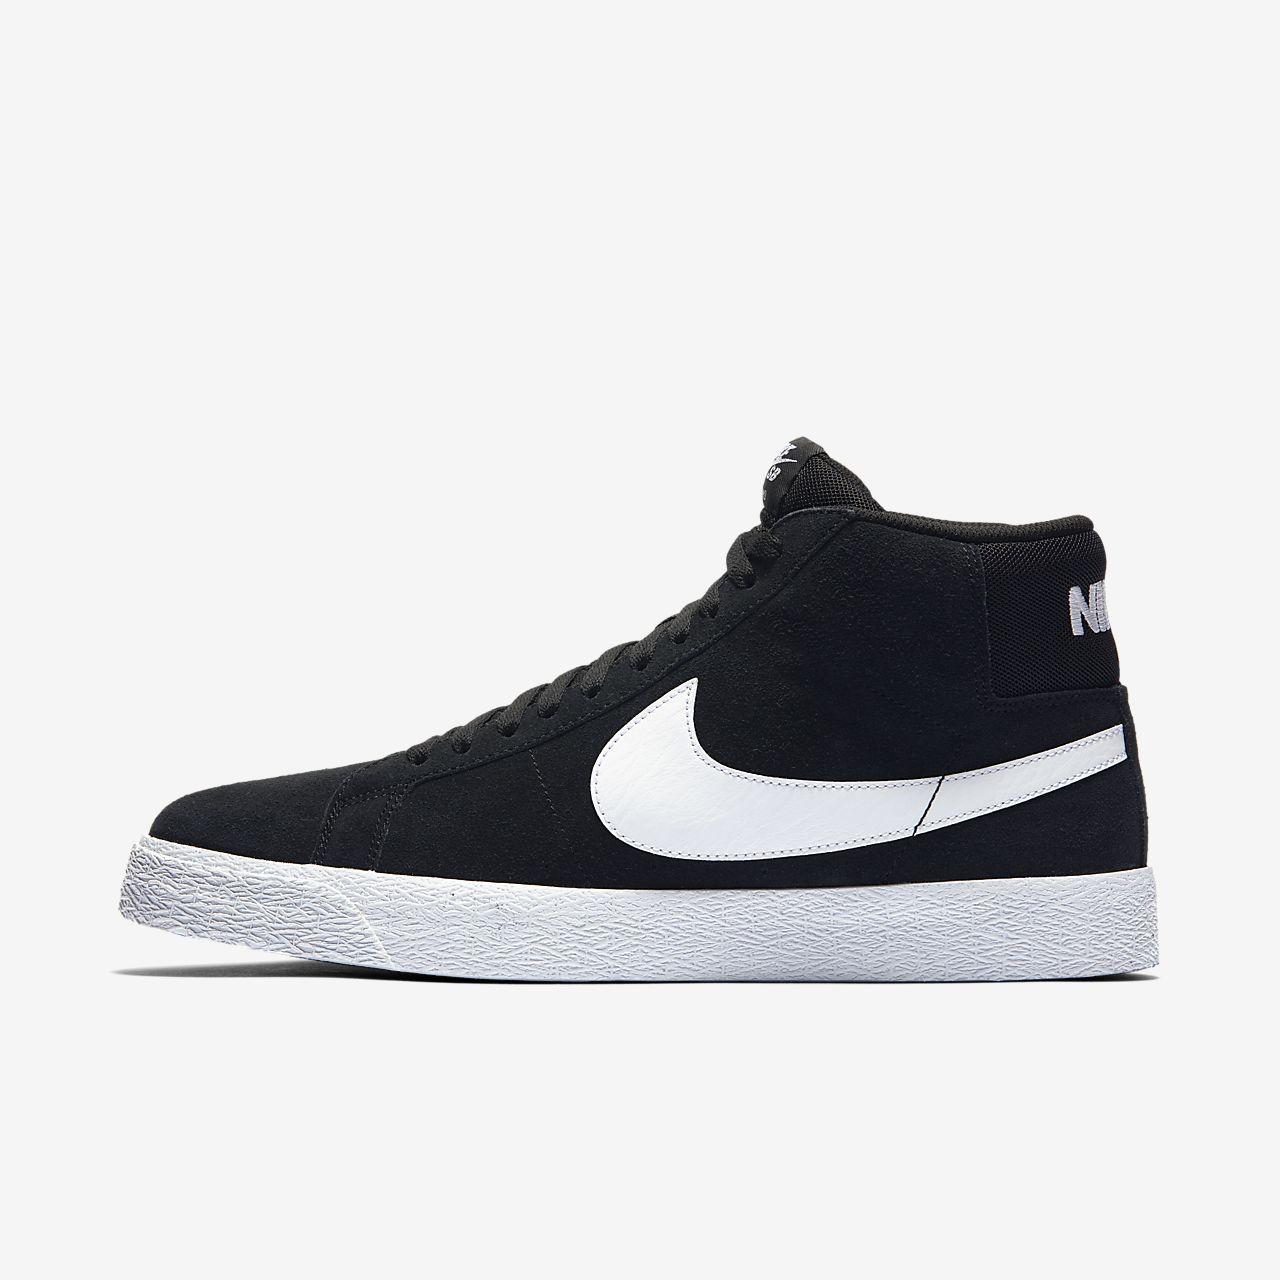 nike sb blazer mid mens skateboarding shoe